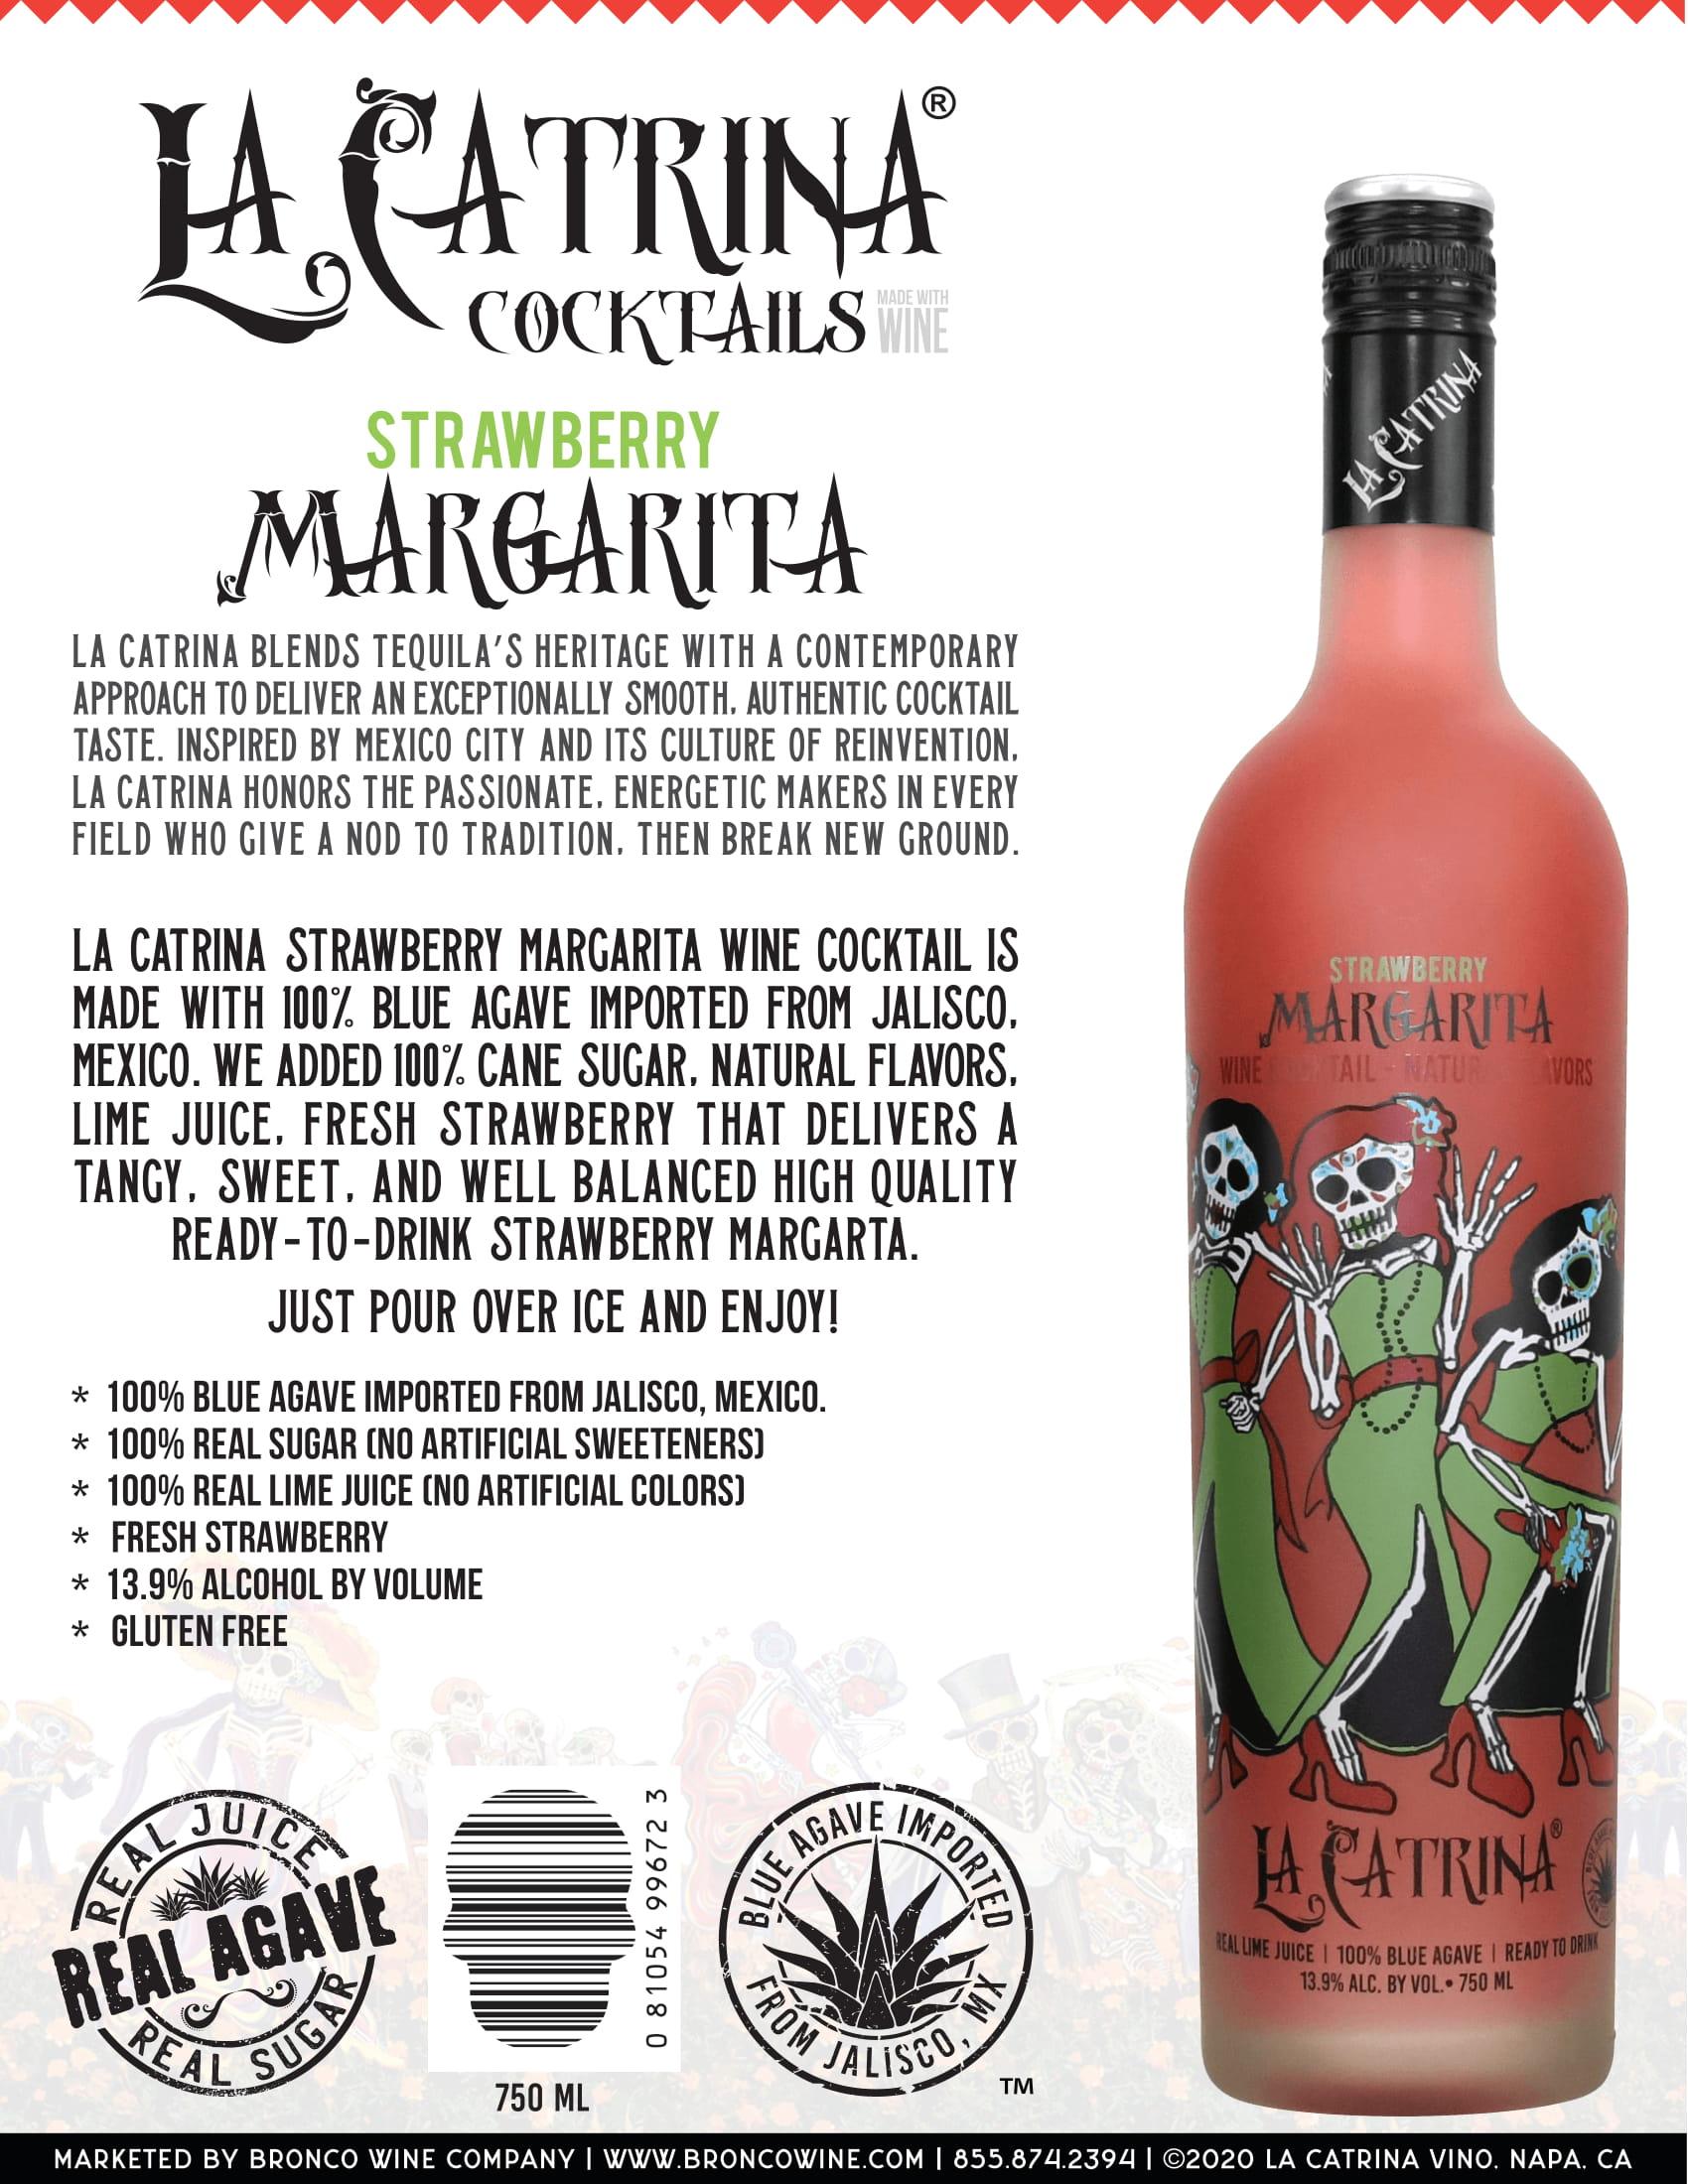 La Catrina Cocktails Strawberry Margarita Tech Sheet